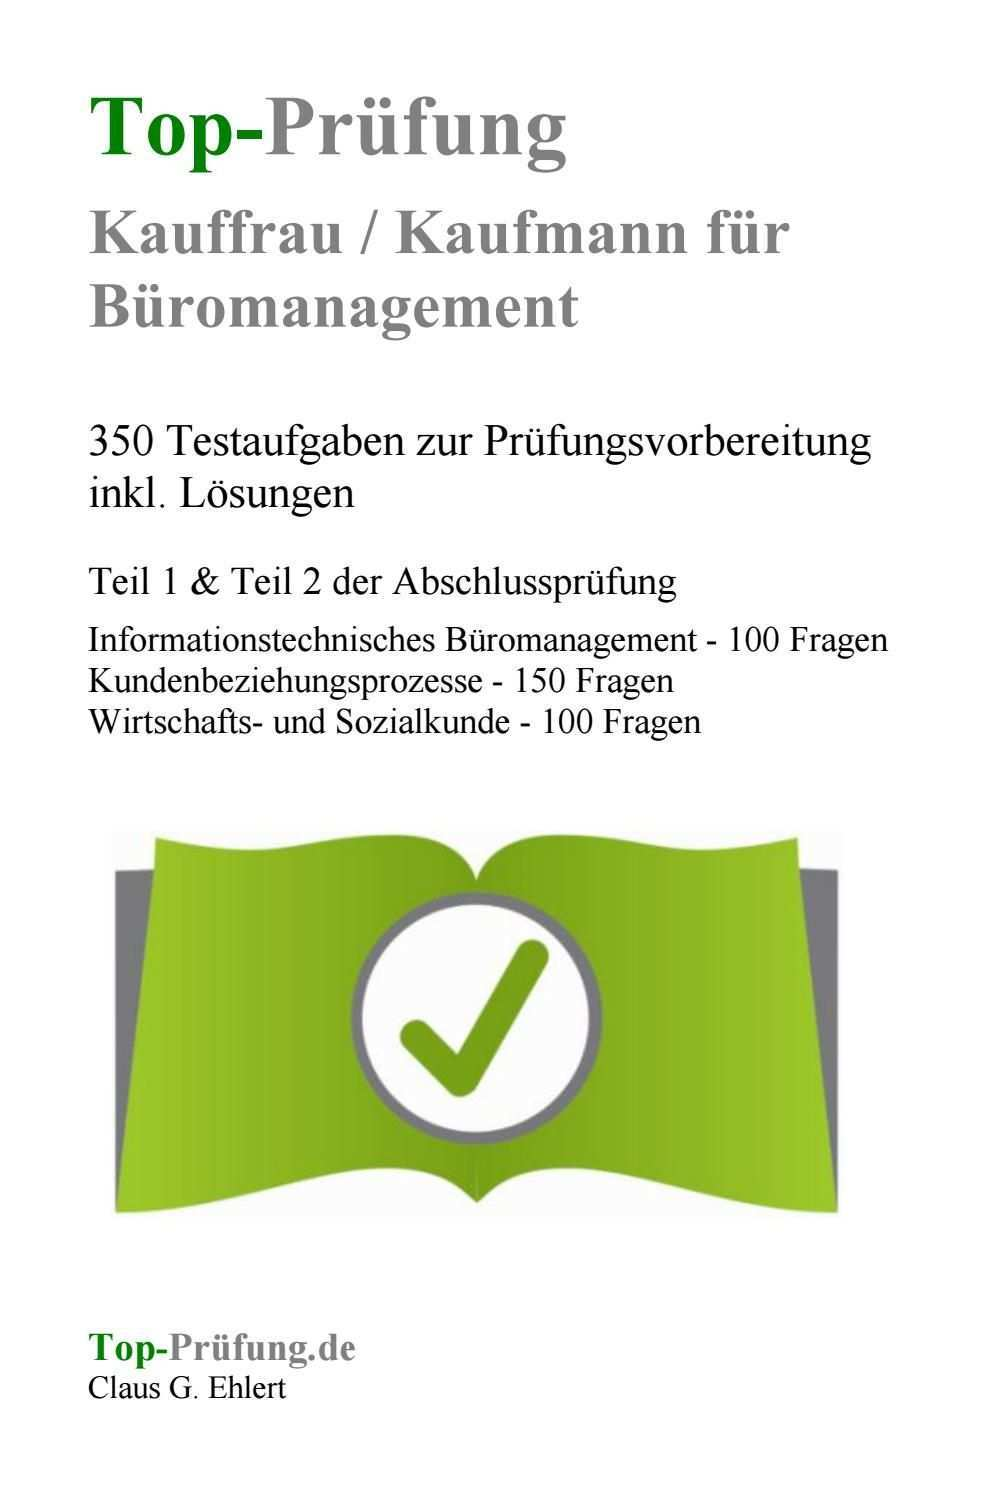 Http Www Top Pruefung De Bueromanagement Html Kauffrau Kaufmann Fur Buromanagement Kauffrau Prufungsvorbereitung Burokauffrau